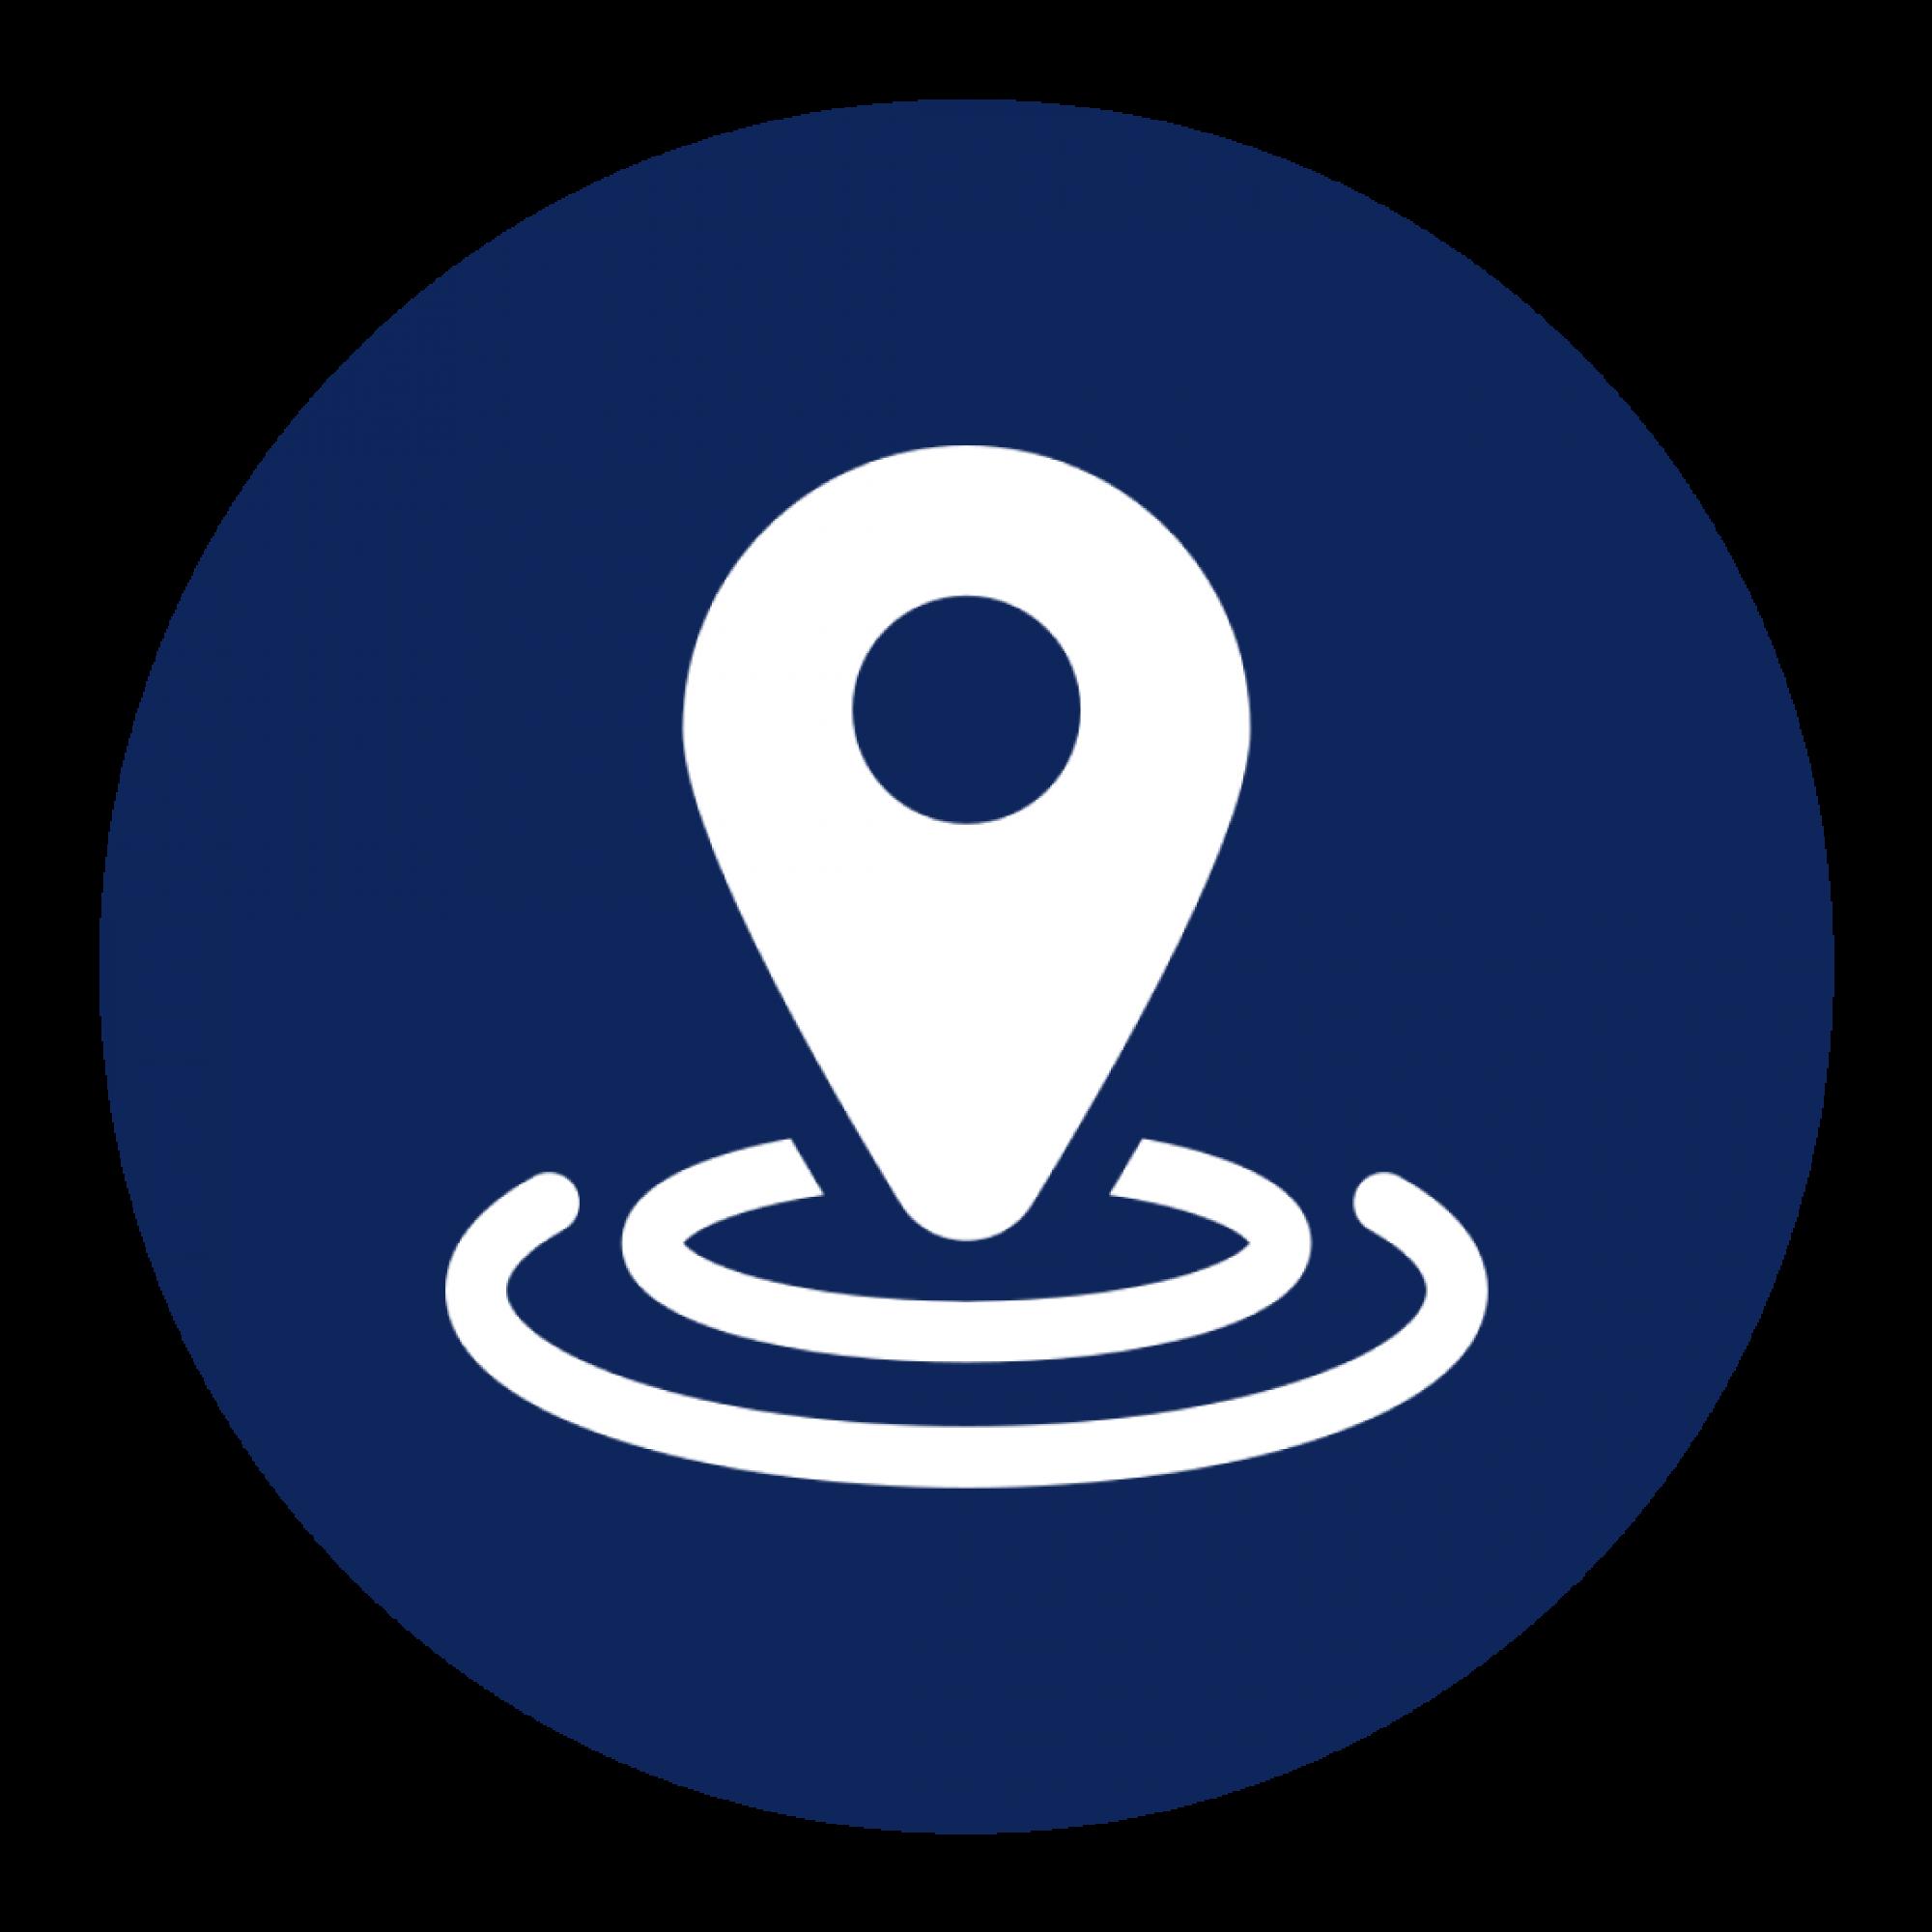 navigationgls